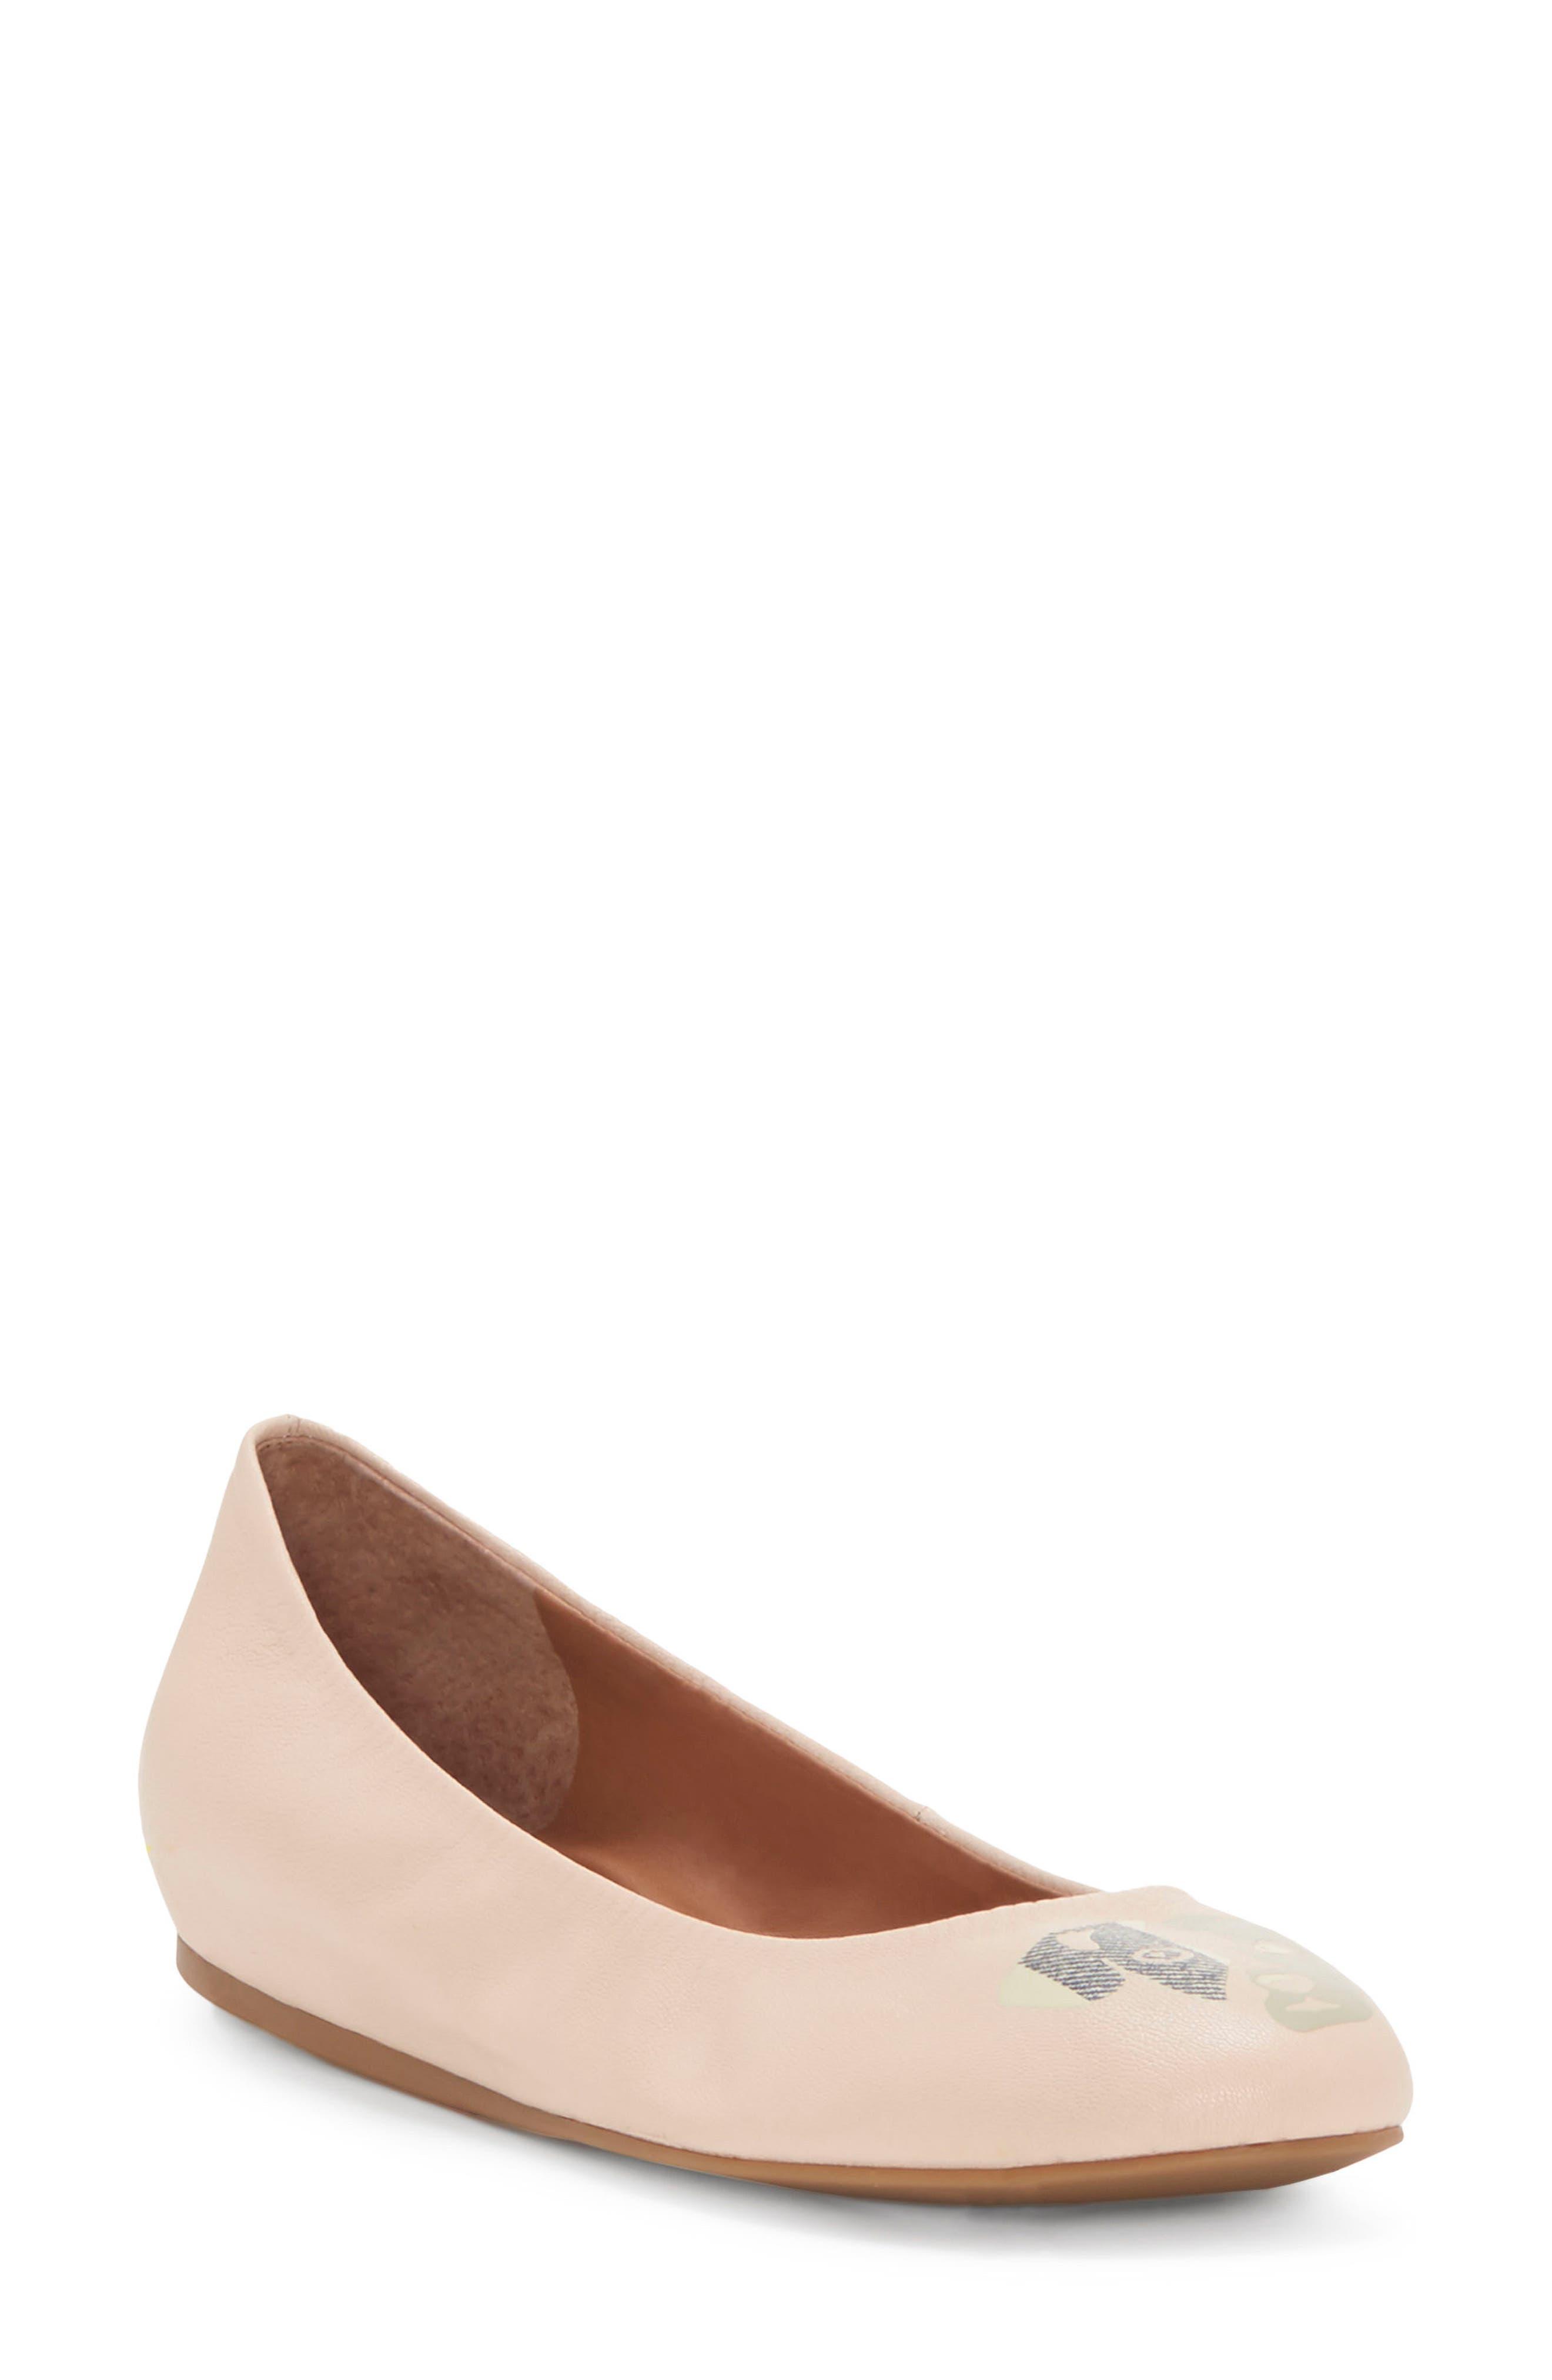 'Langston' Ballet Flat,                         Main,                         color, Misty Rose Leather